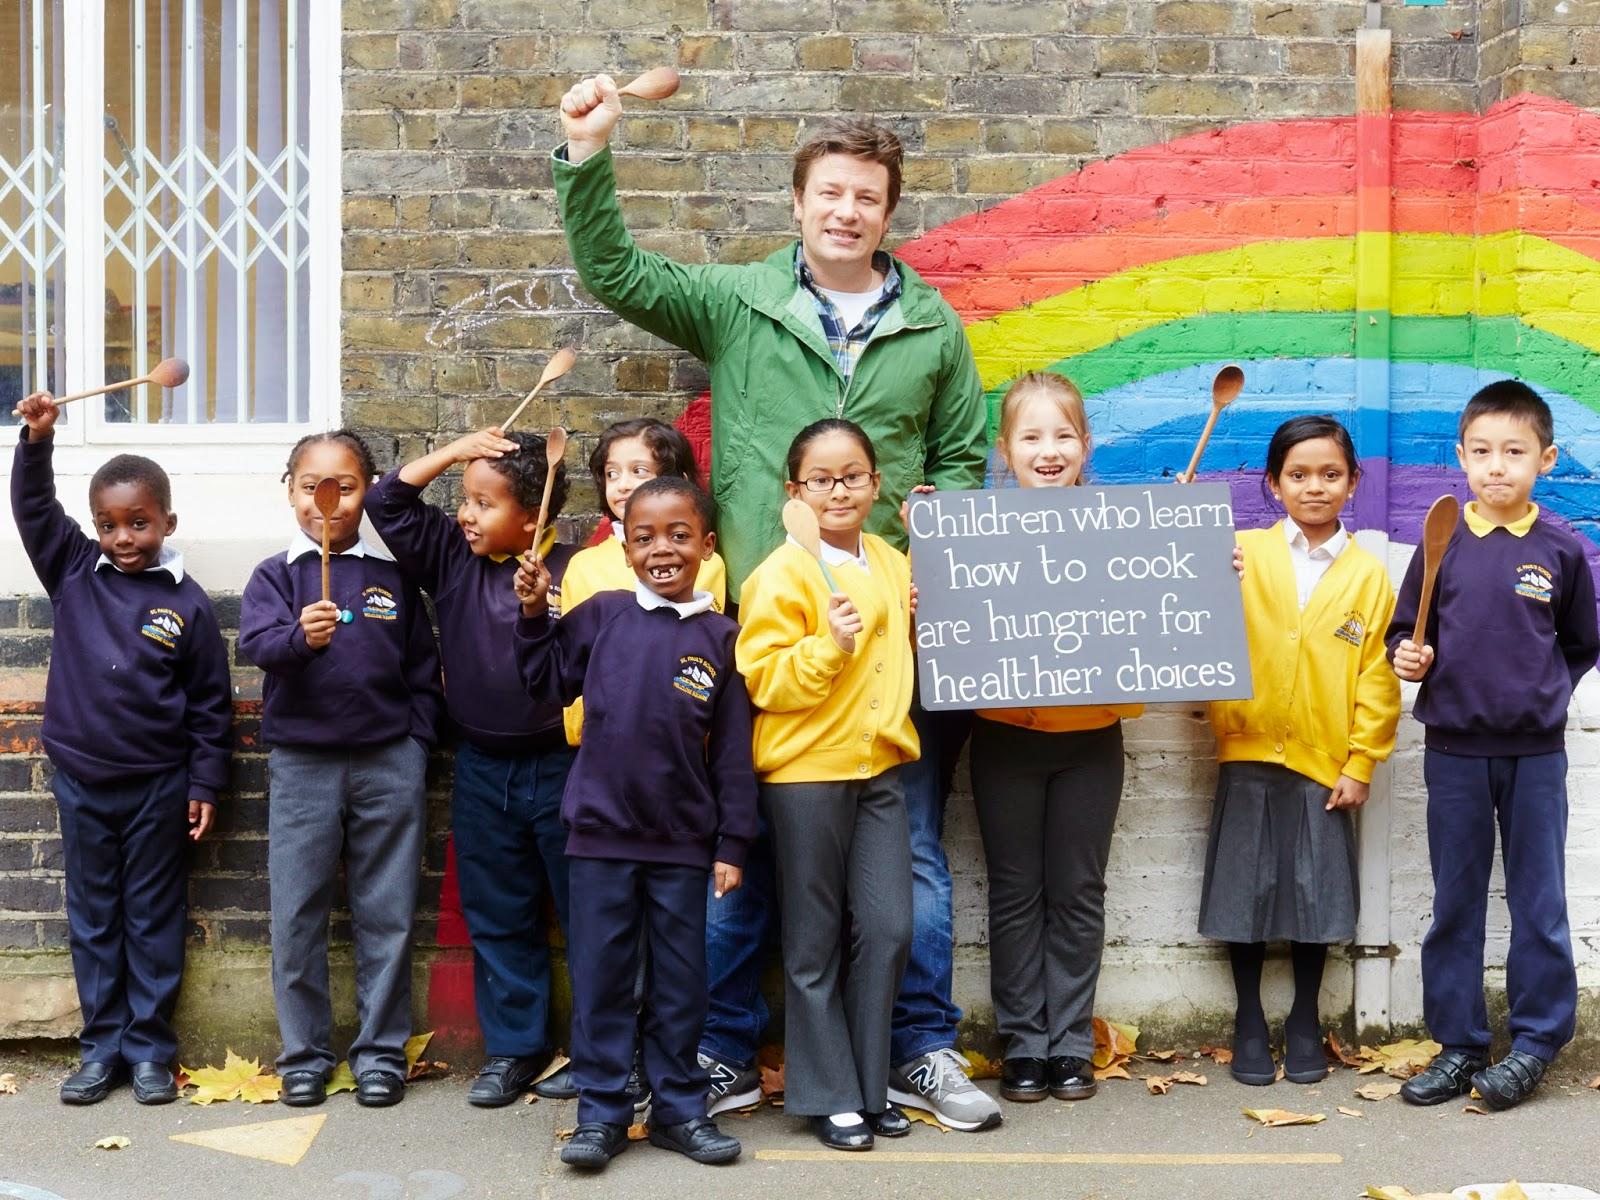 Photos copyright Jamie Oliver Enterprise Ltd, taken by David Lofuts